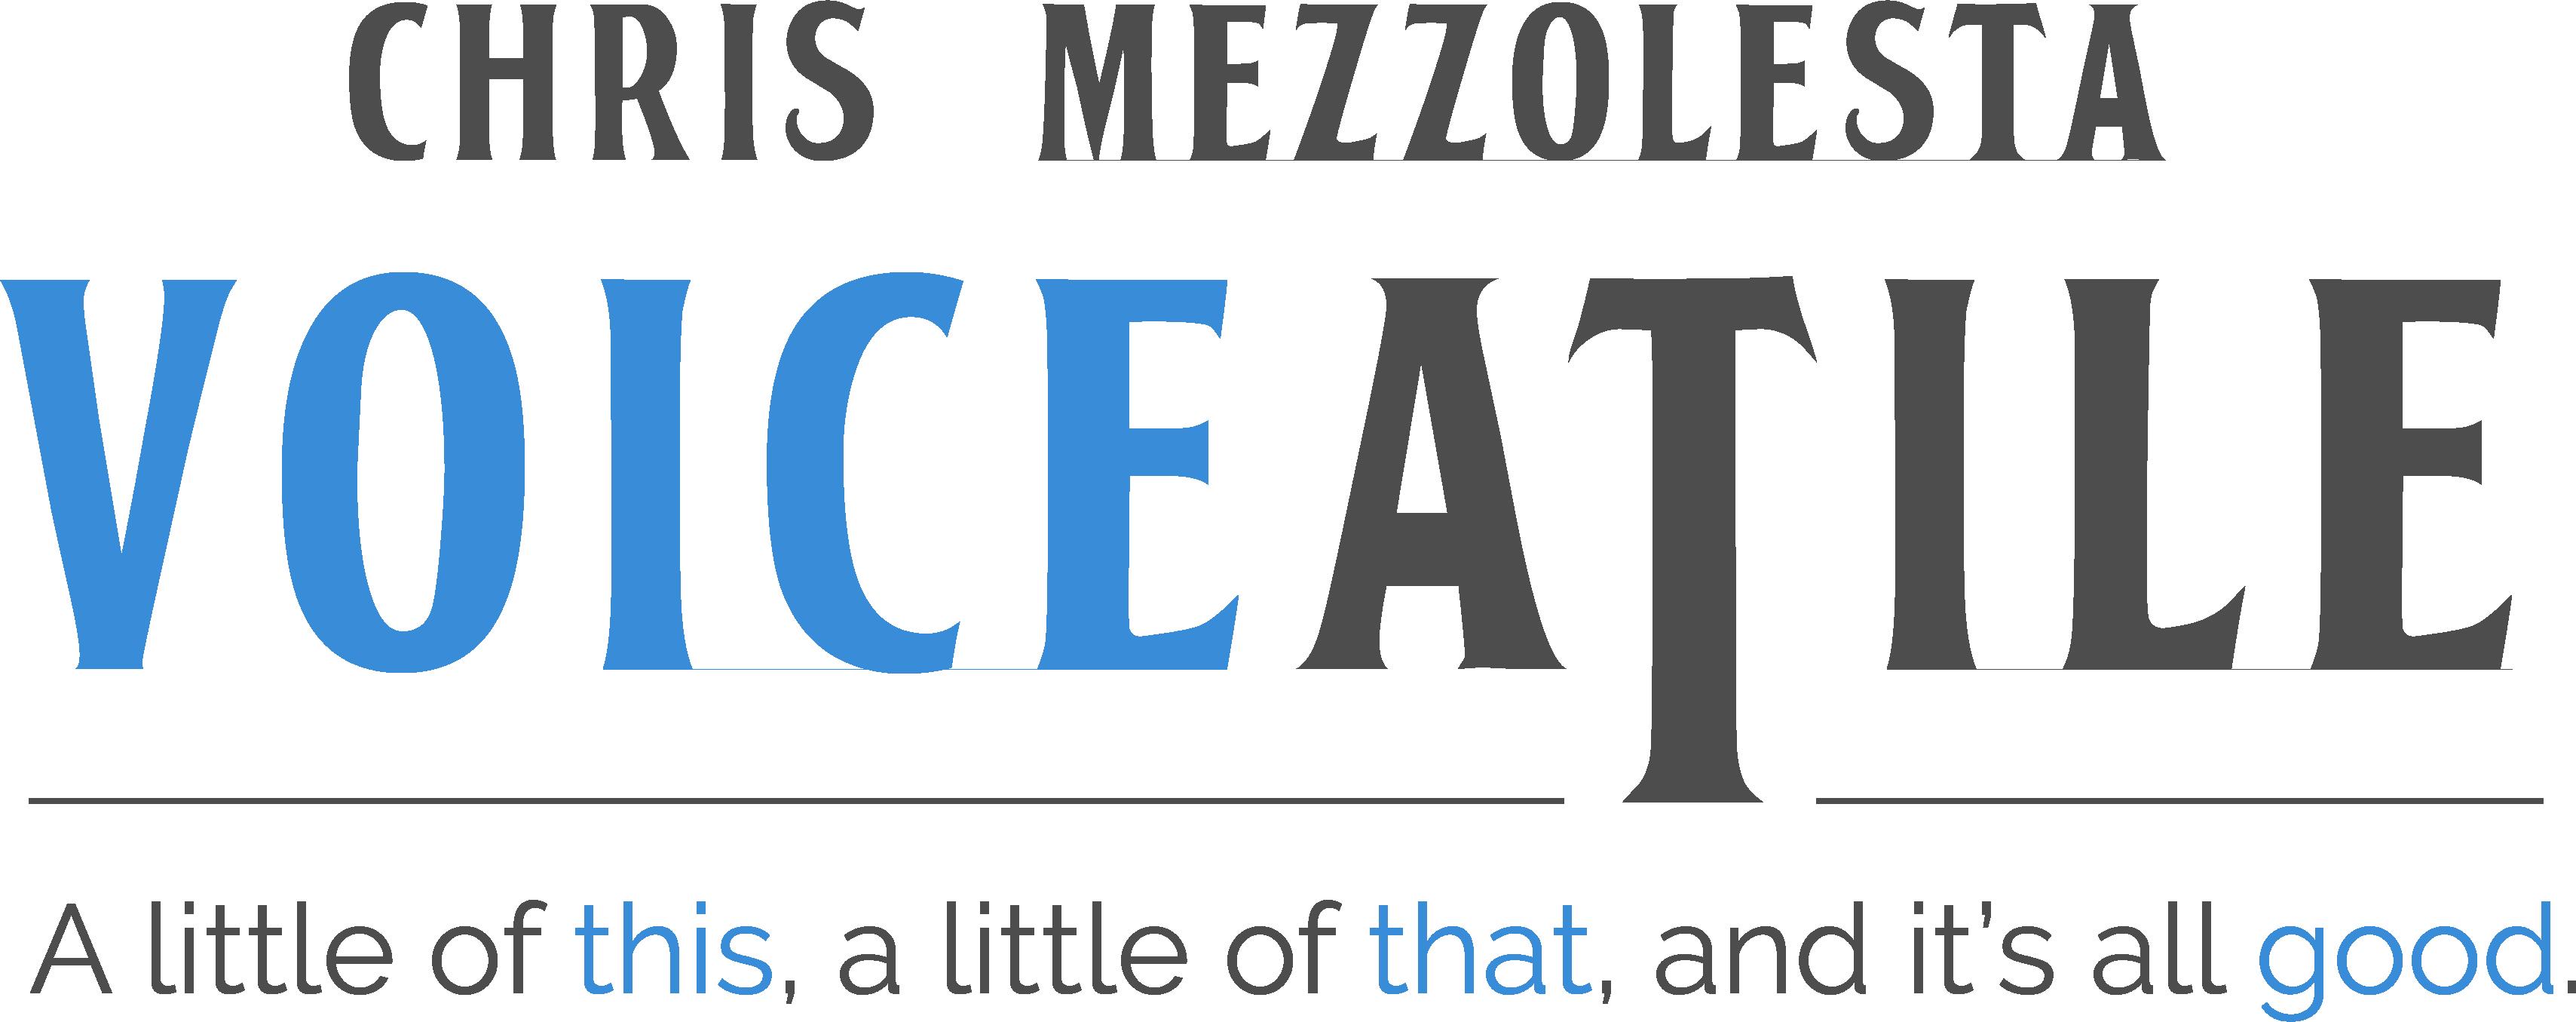 Chris Mezzolesta logo